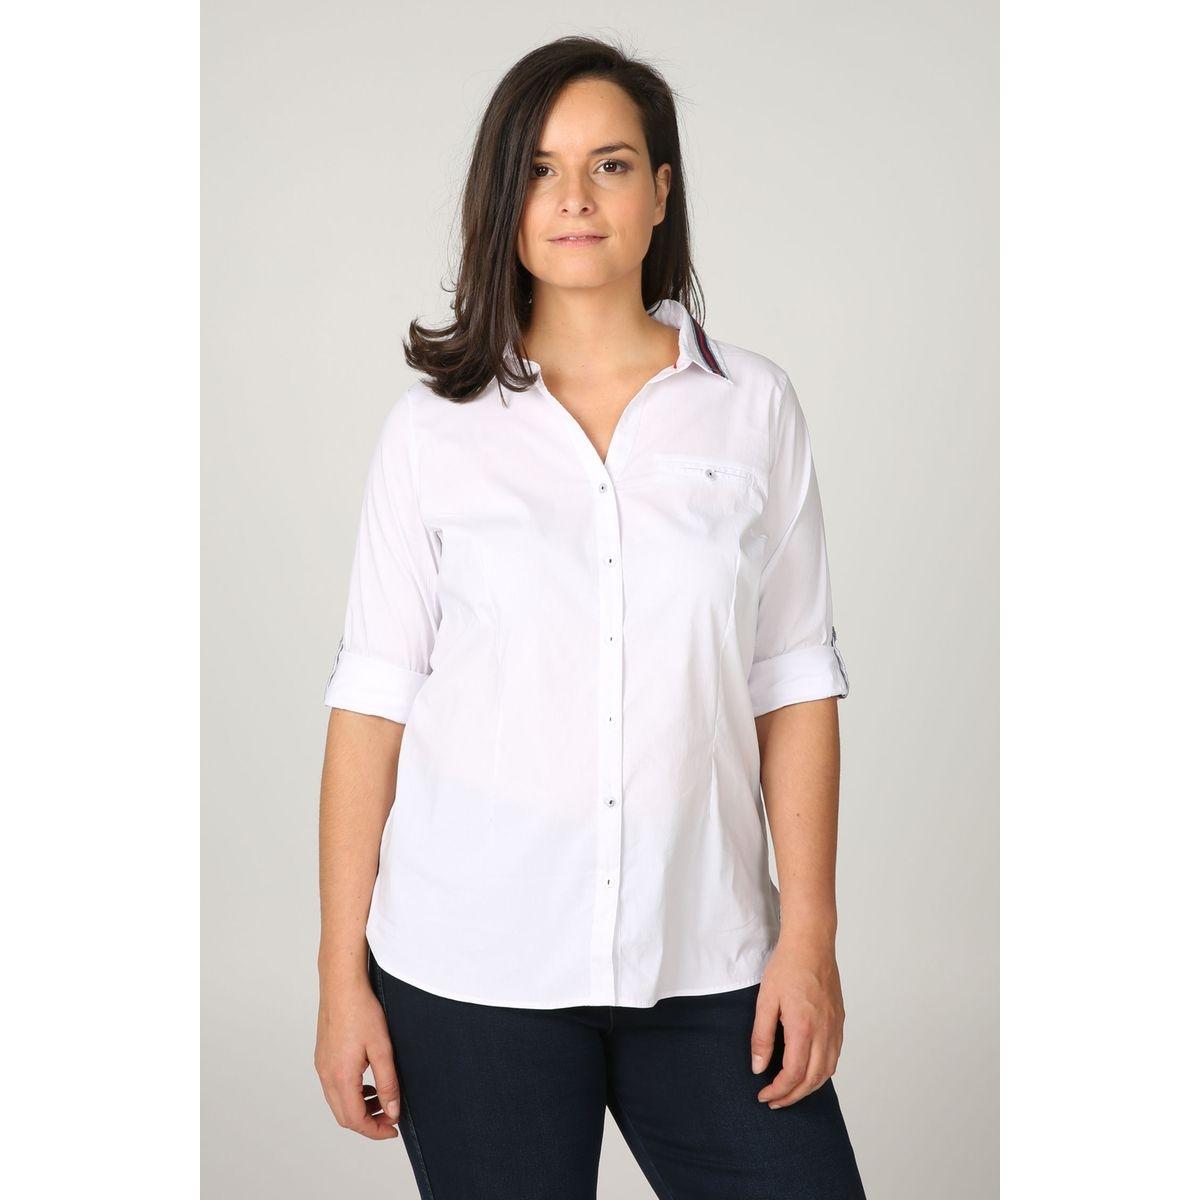 Chemisier détails bandes sportswear Col polo, chemise Manches longues